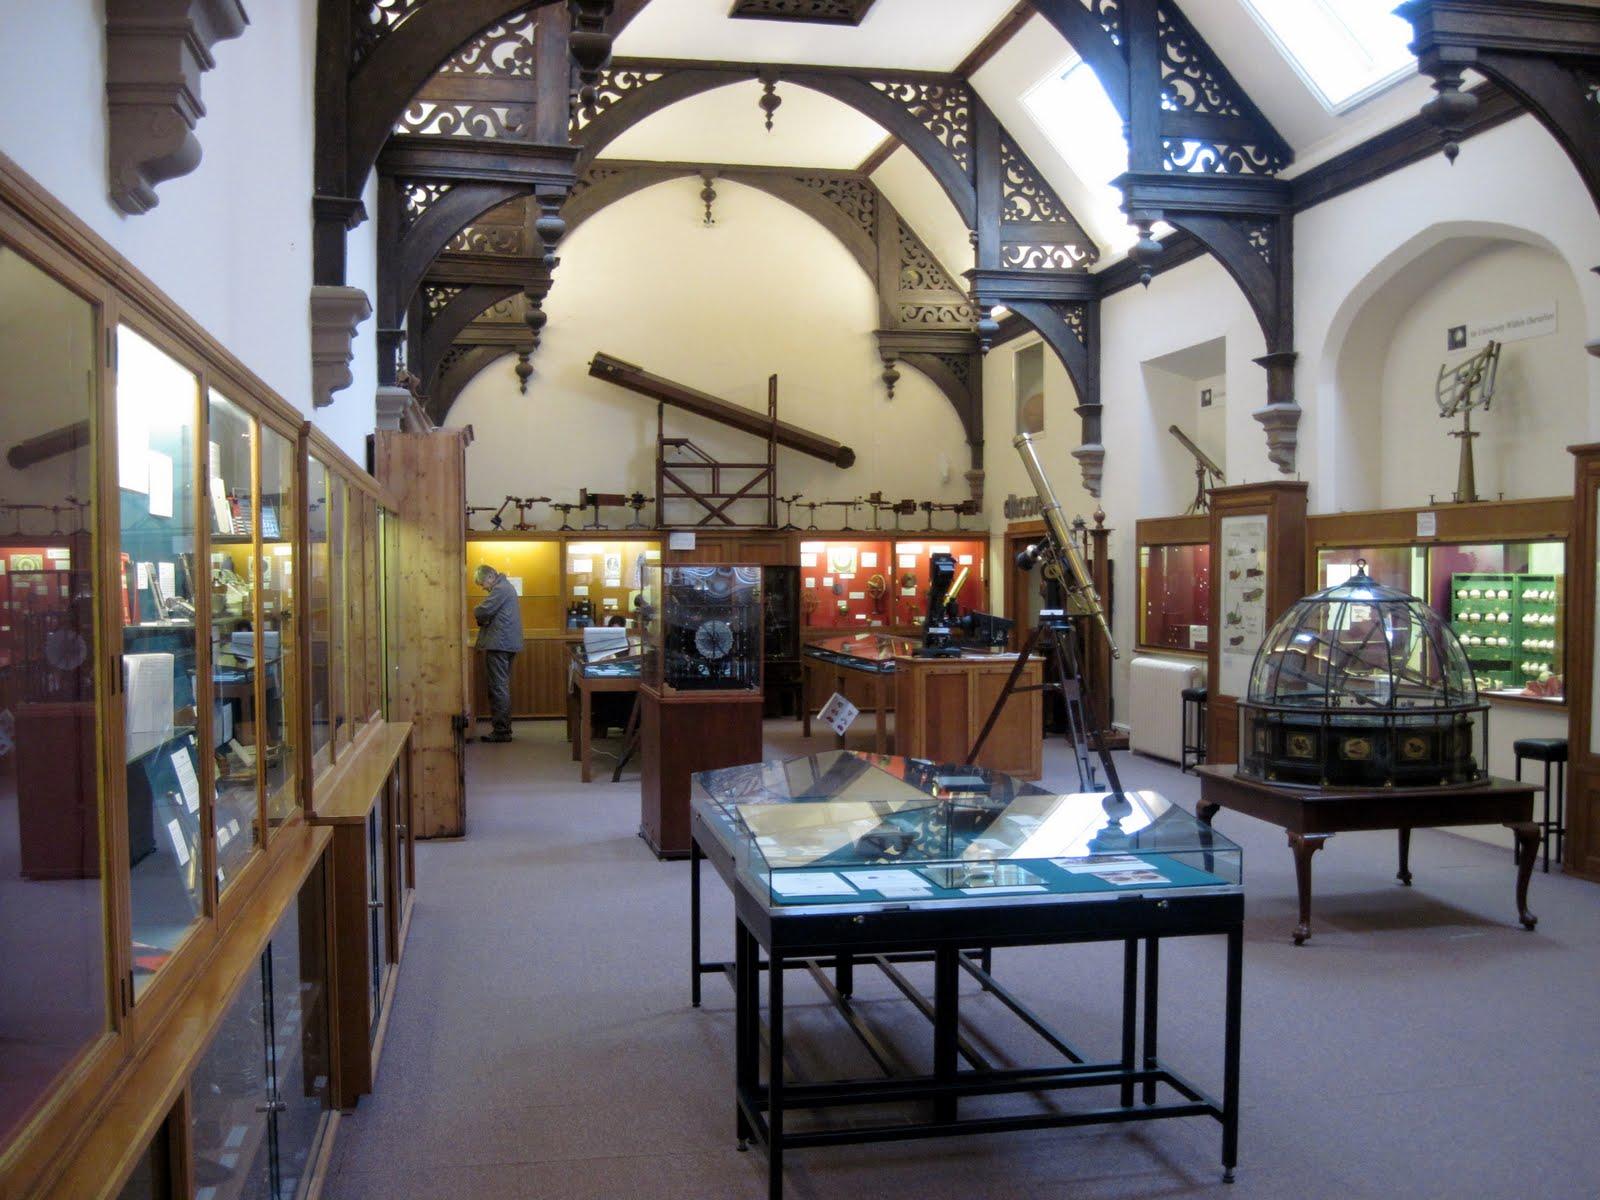 Whipple Museum